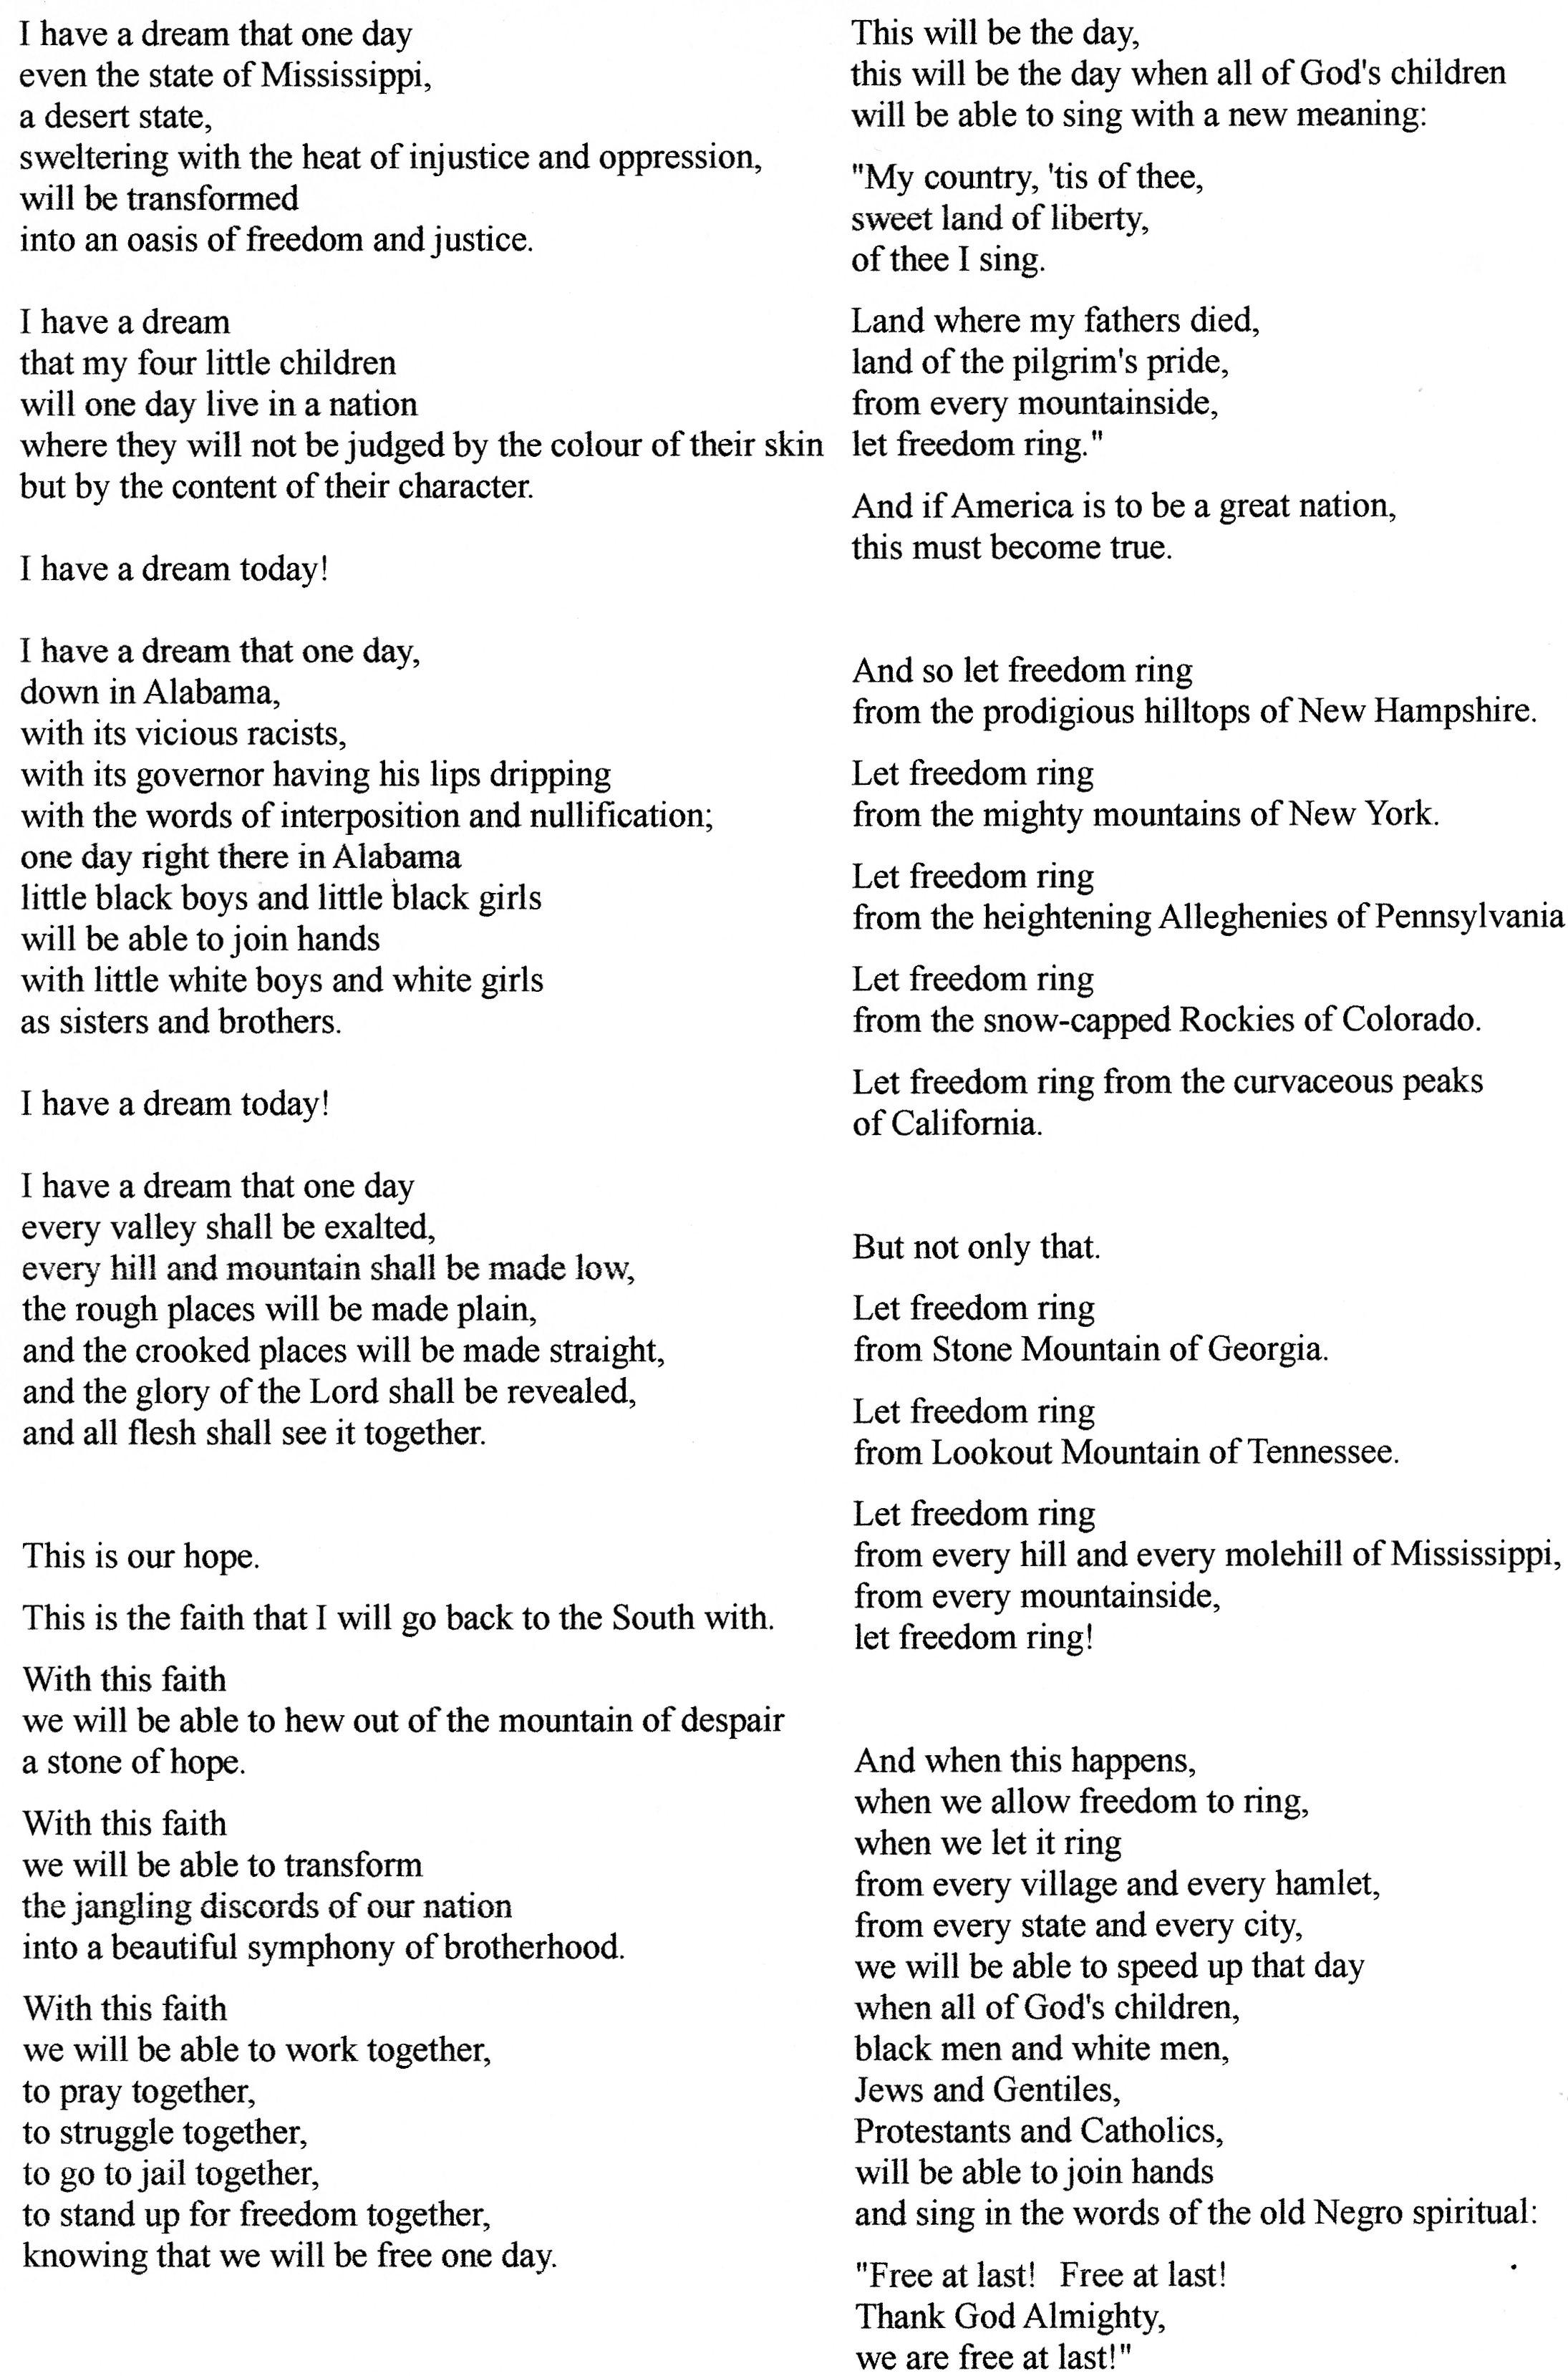 English fun day essay